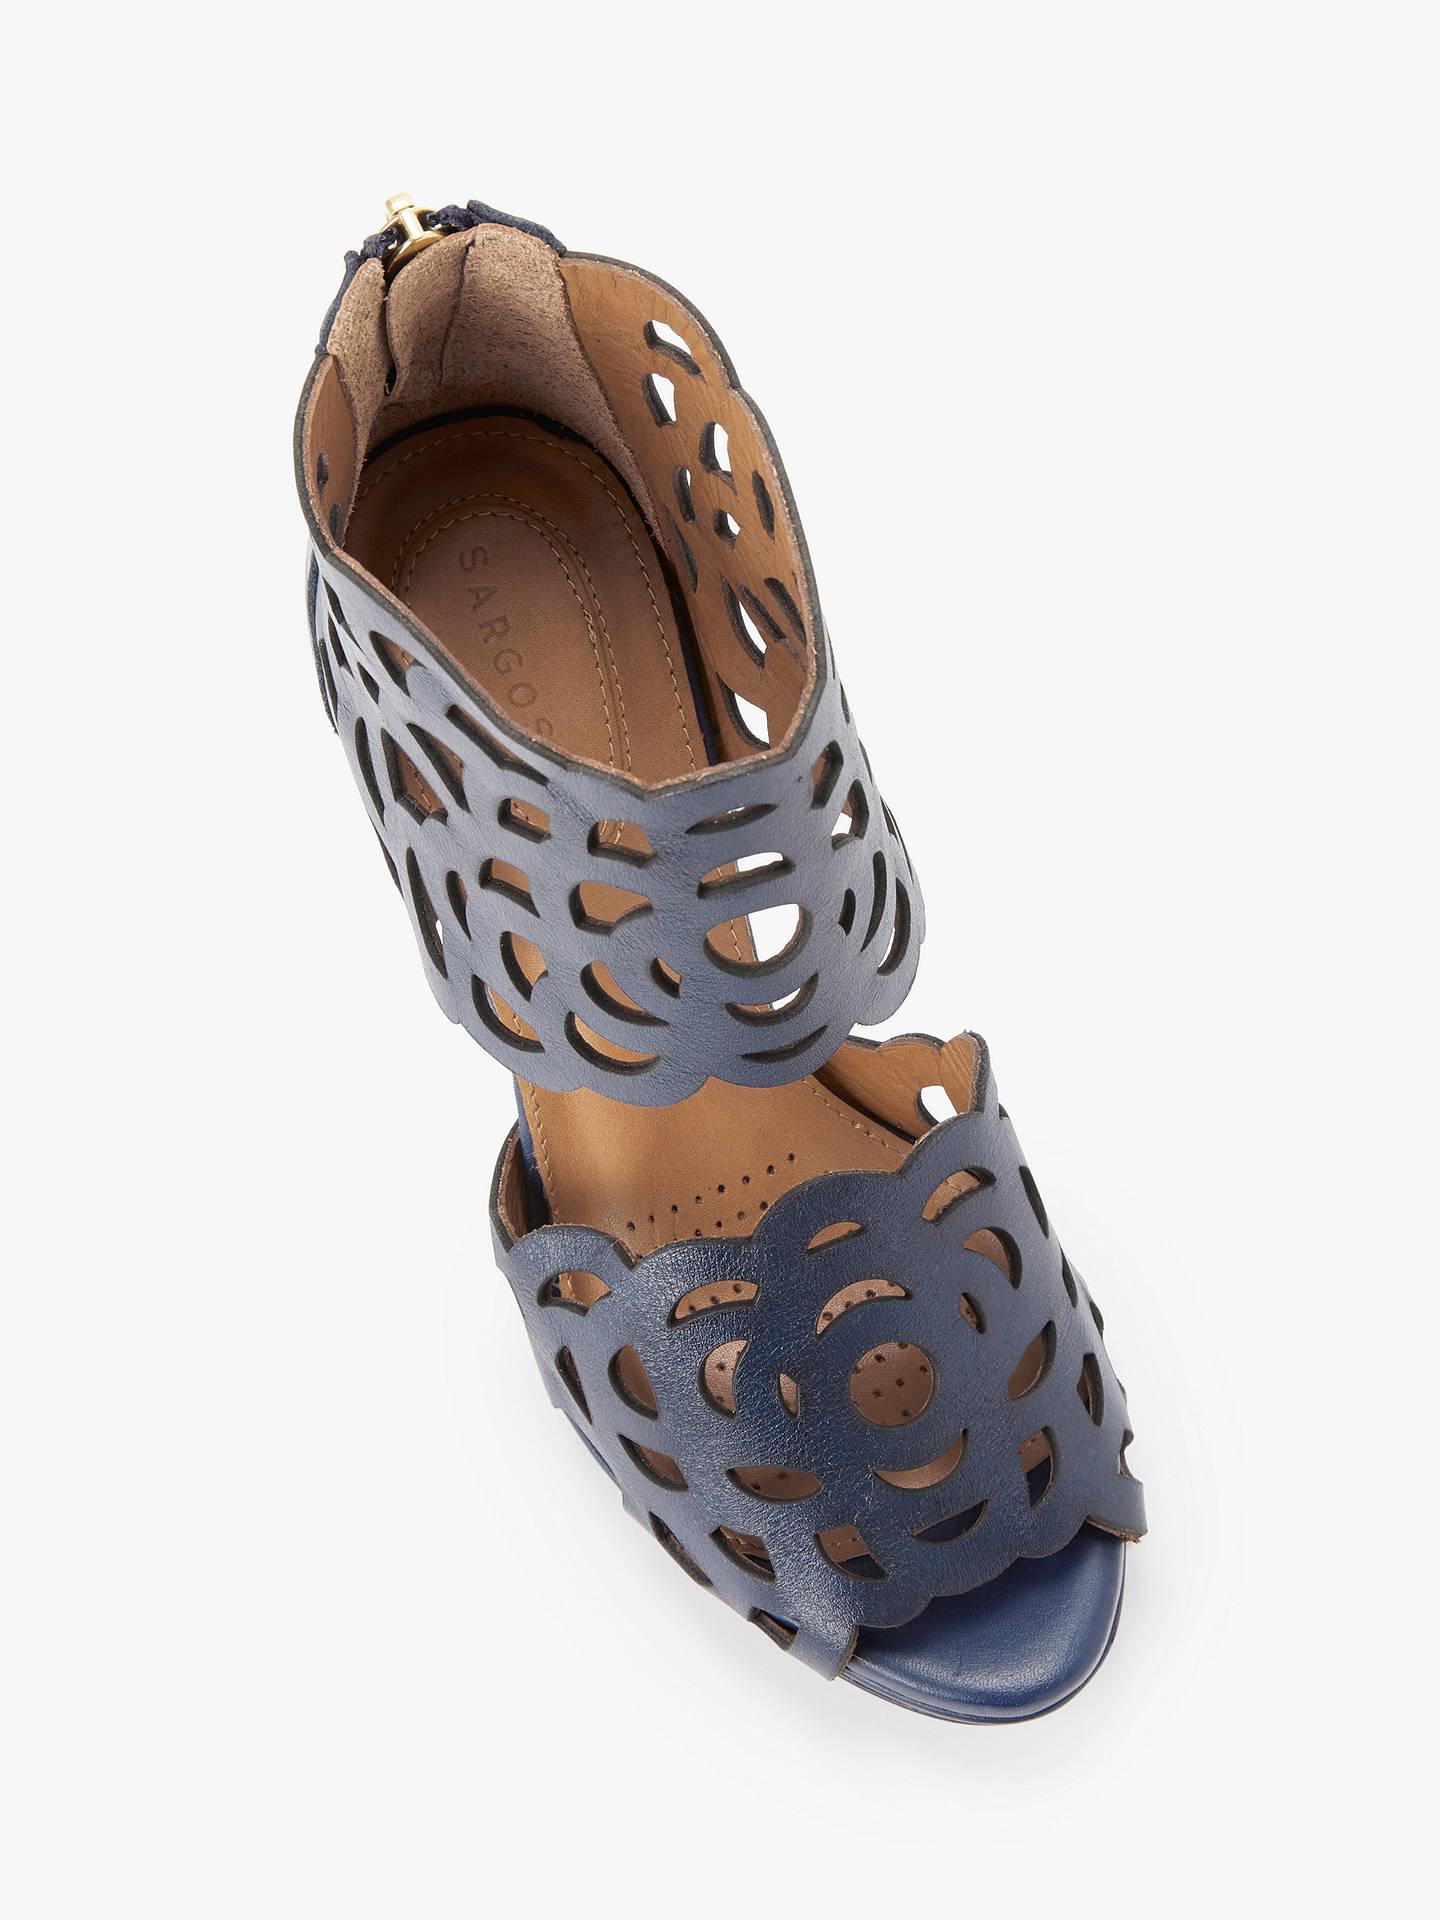 3a410476e214 ... Buy Sargossa Inspire Stiletto Heel Sandals